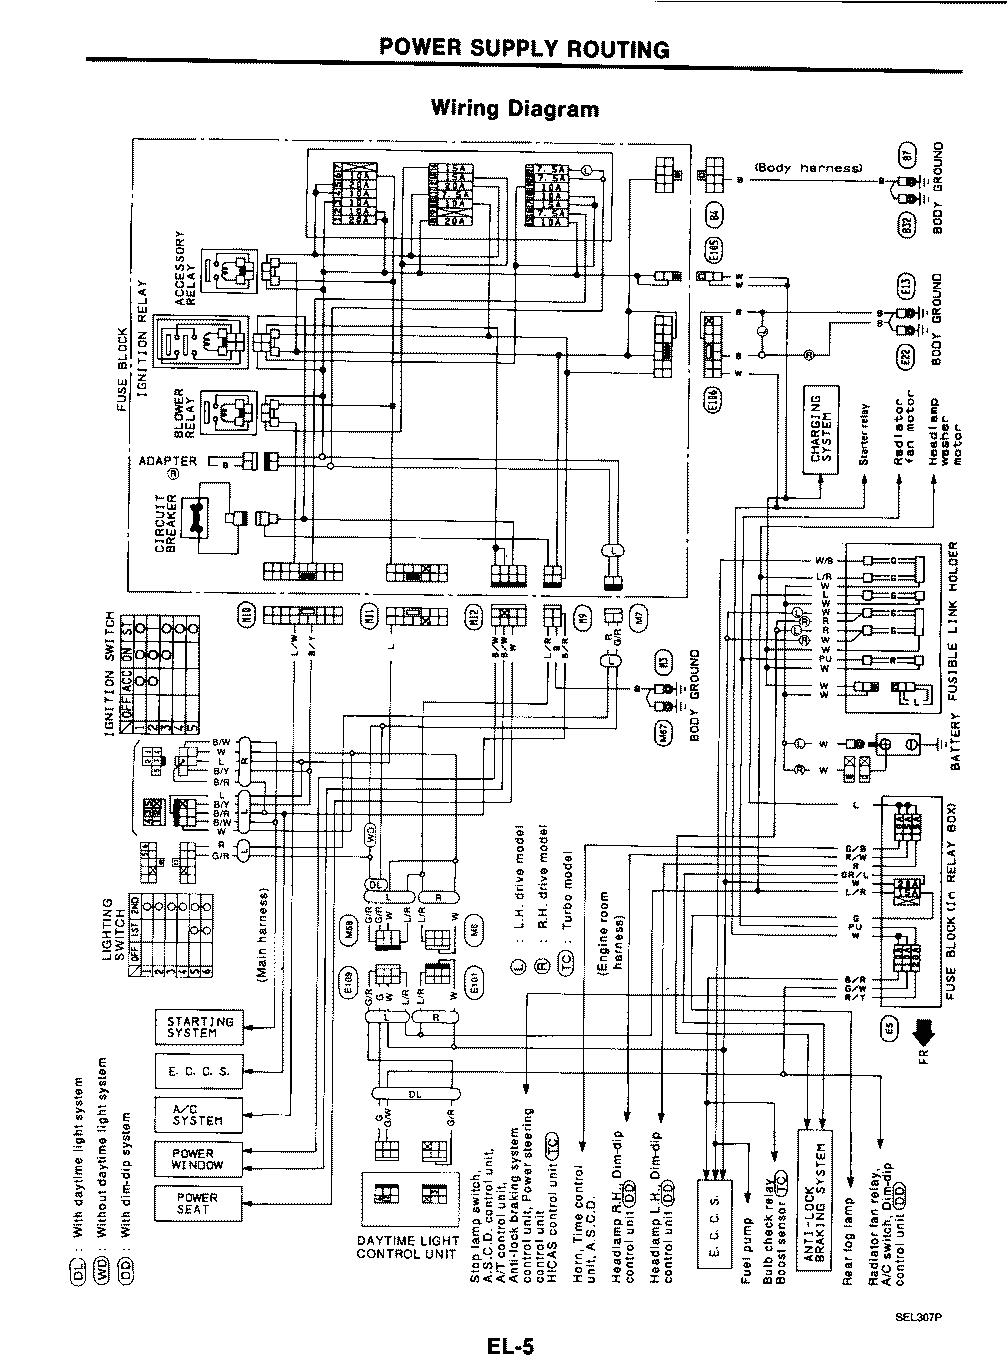 2006 Nissan Altima Fuel Pump Wiring Diagram A Diagram Baseda Qg18 Nissan Wiring Diagrams Completed